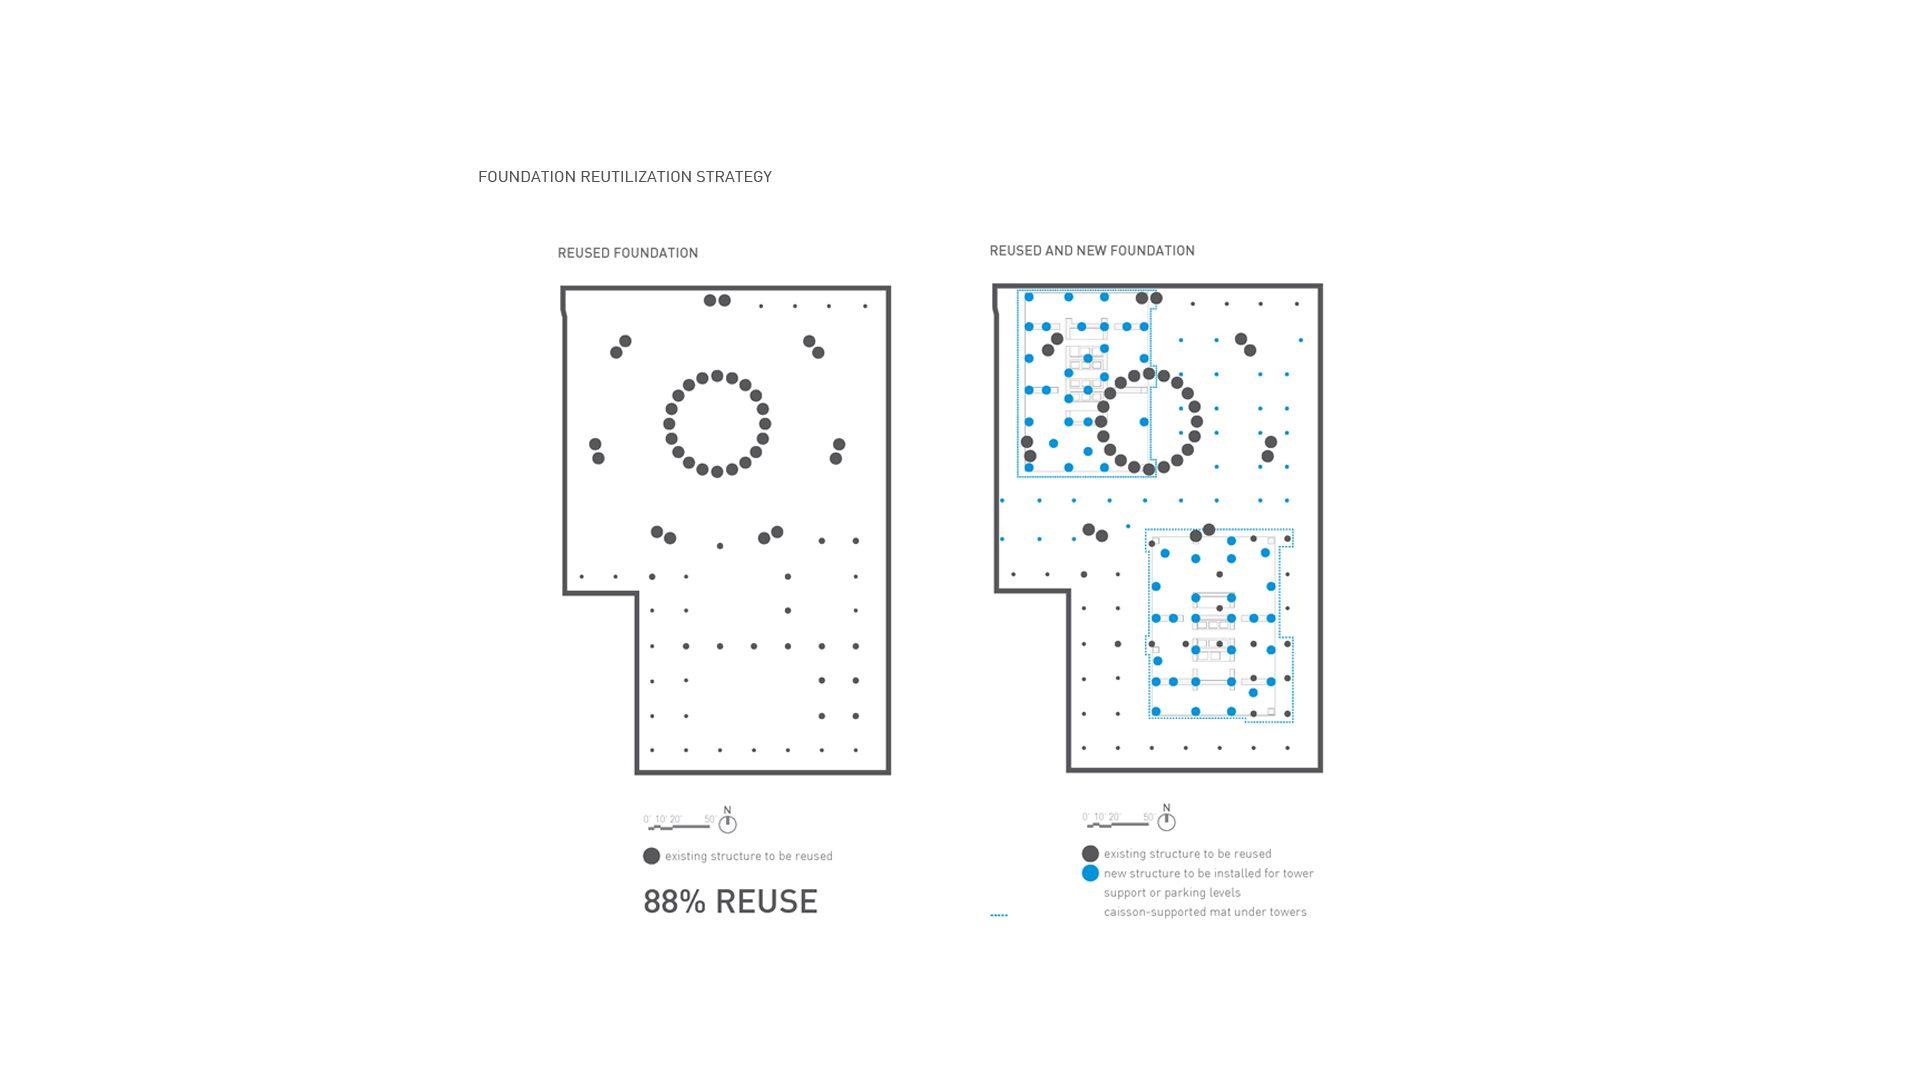 014_Foundation reuse strategy